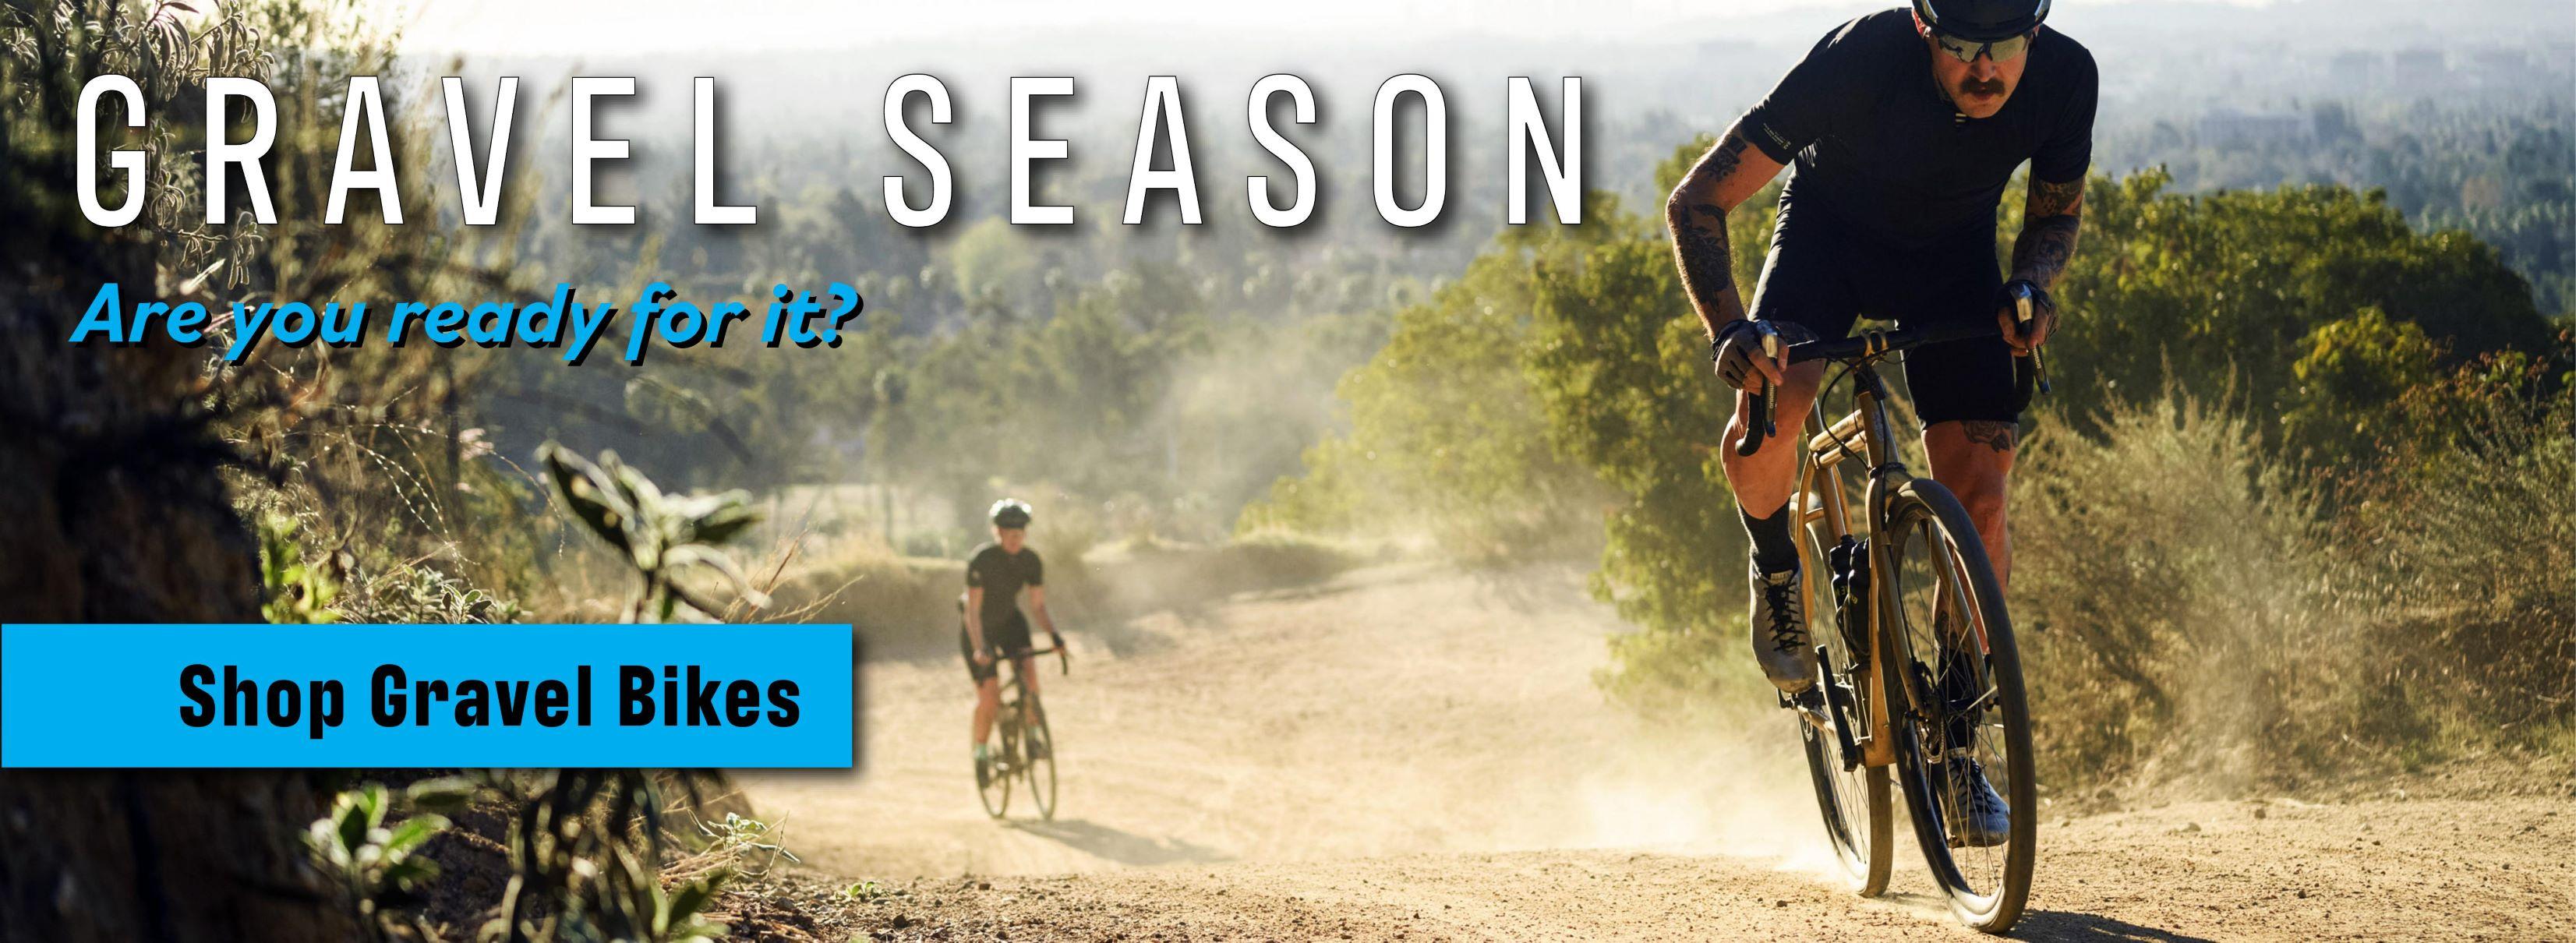 Gravel Bike Season